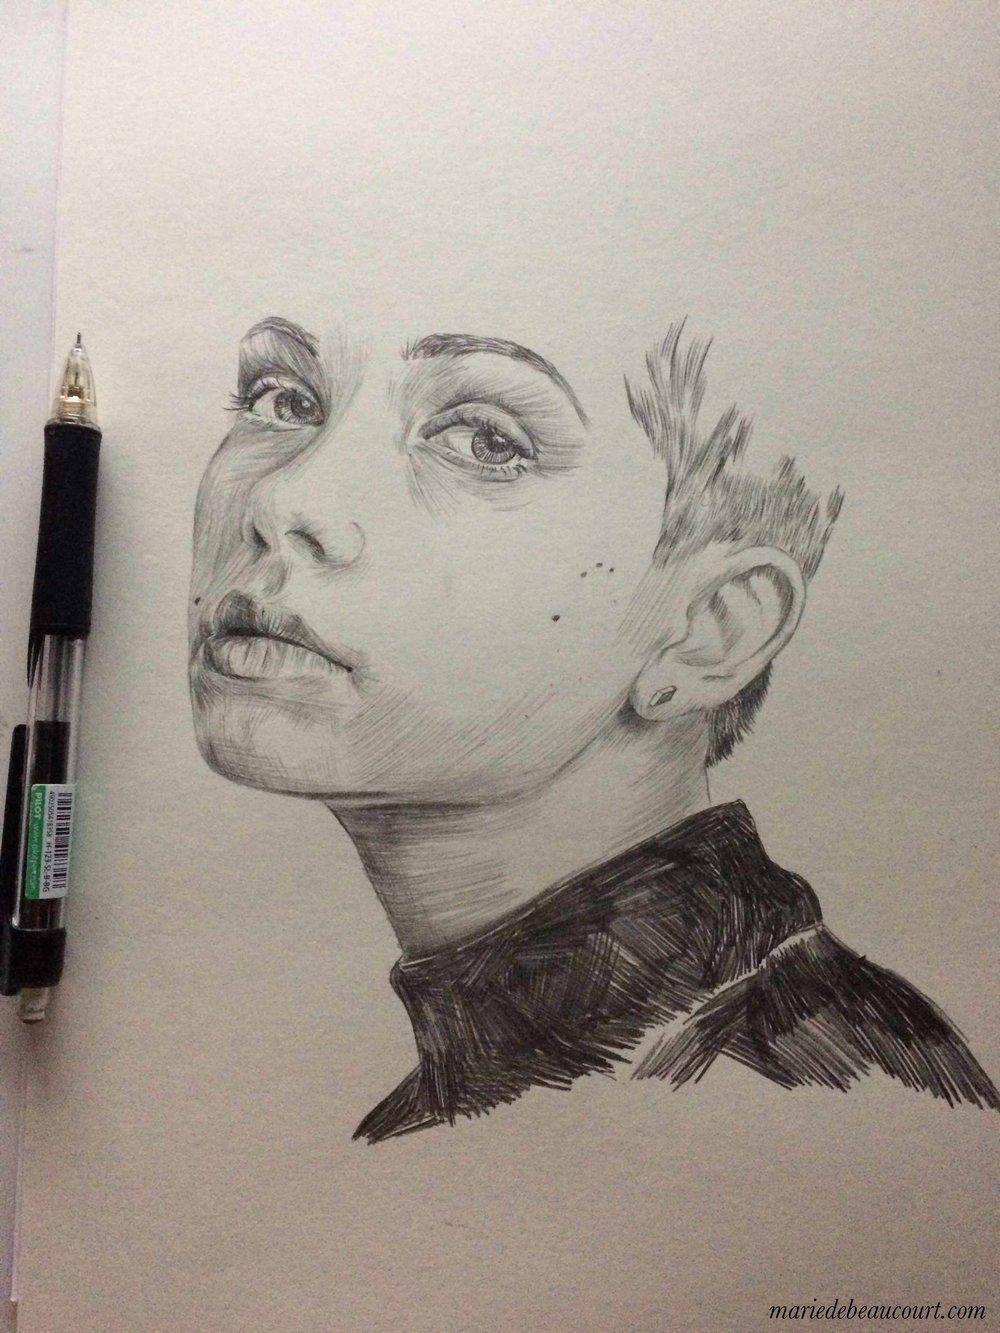 marie-de-beaucourt-illustration-portrait-work-in-progress-1.jpg